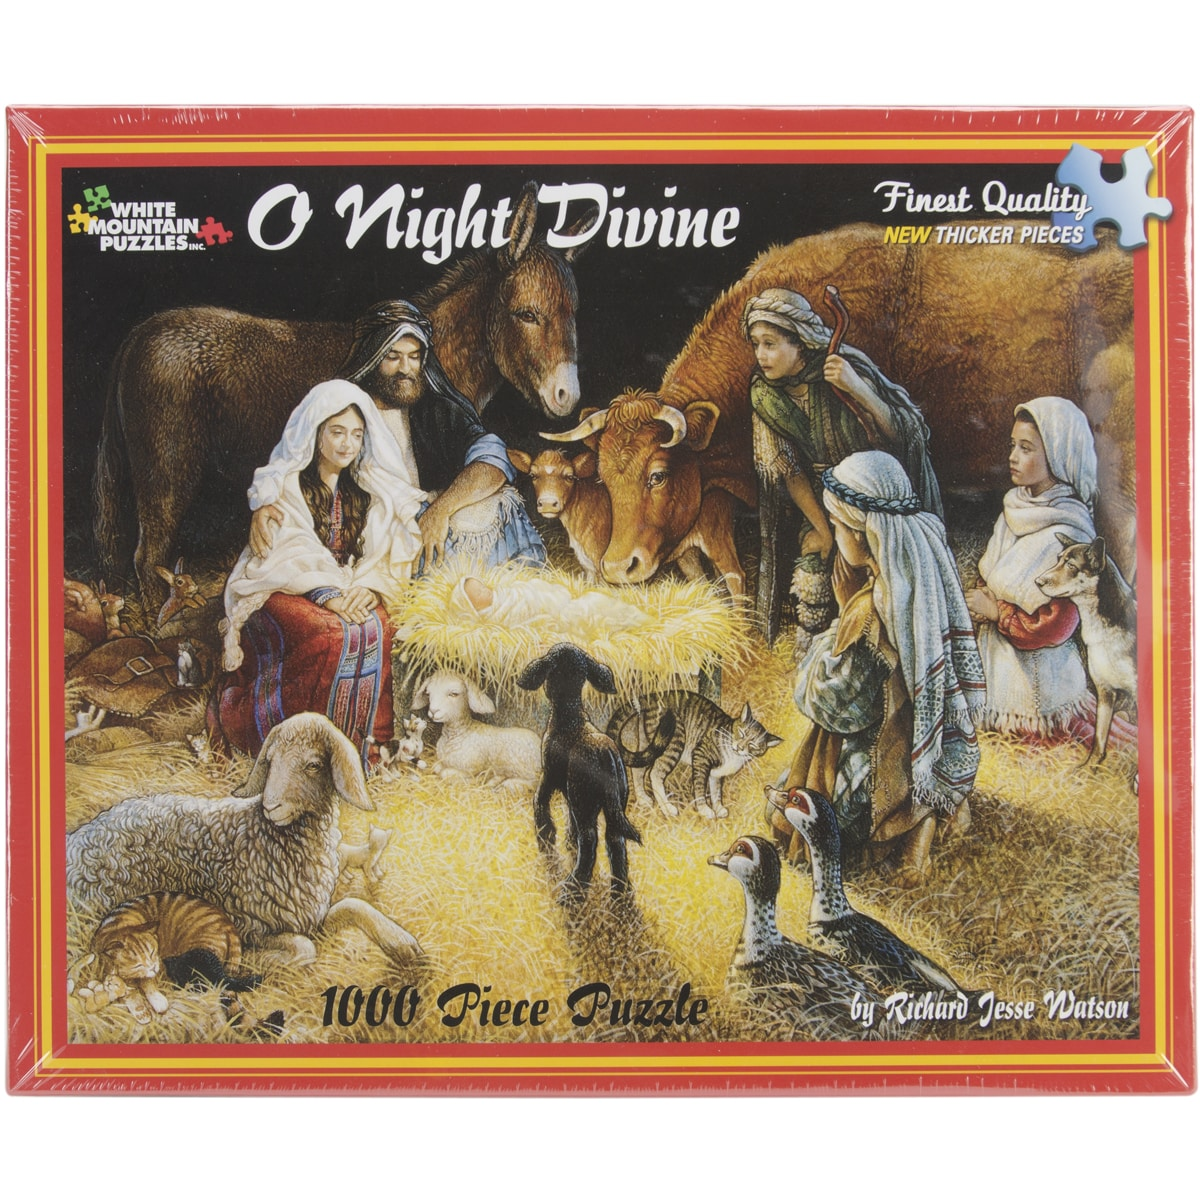 White Mountain Puzzles O Night Divine 1000 Piece Jigsaw P...